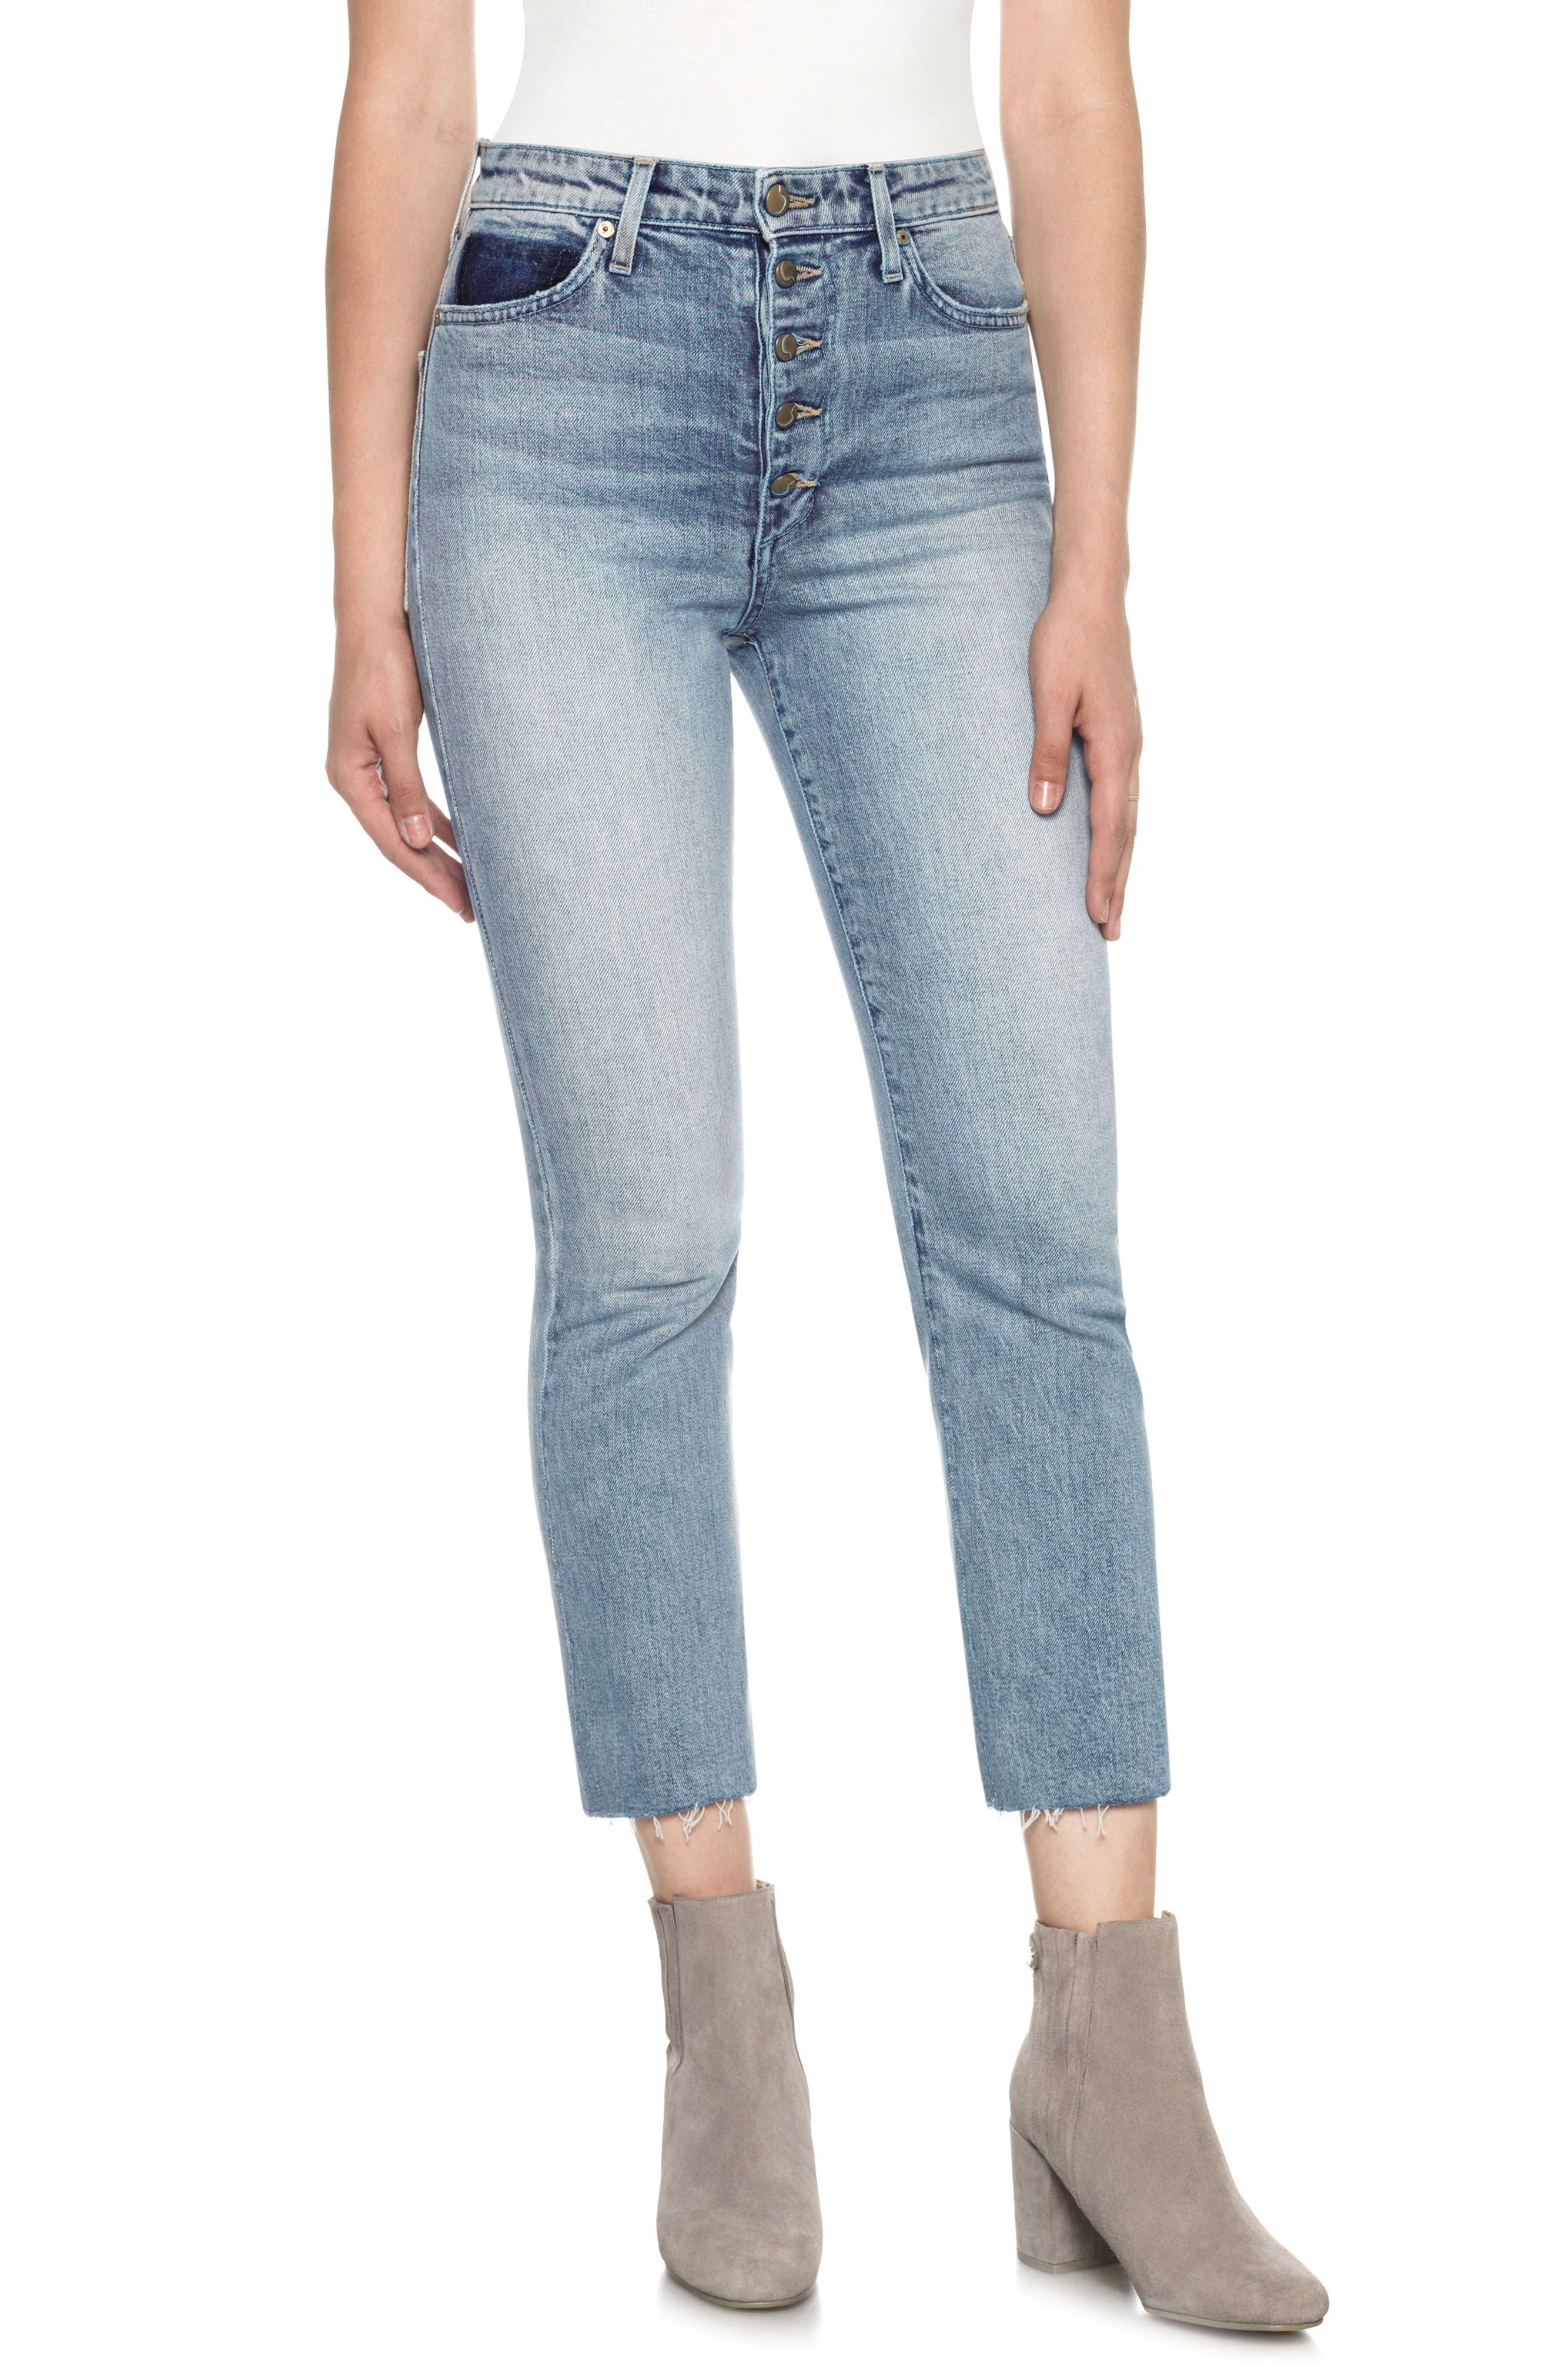 JOES Debbie High Waist Crop Boyfriend Jeans